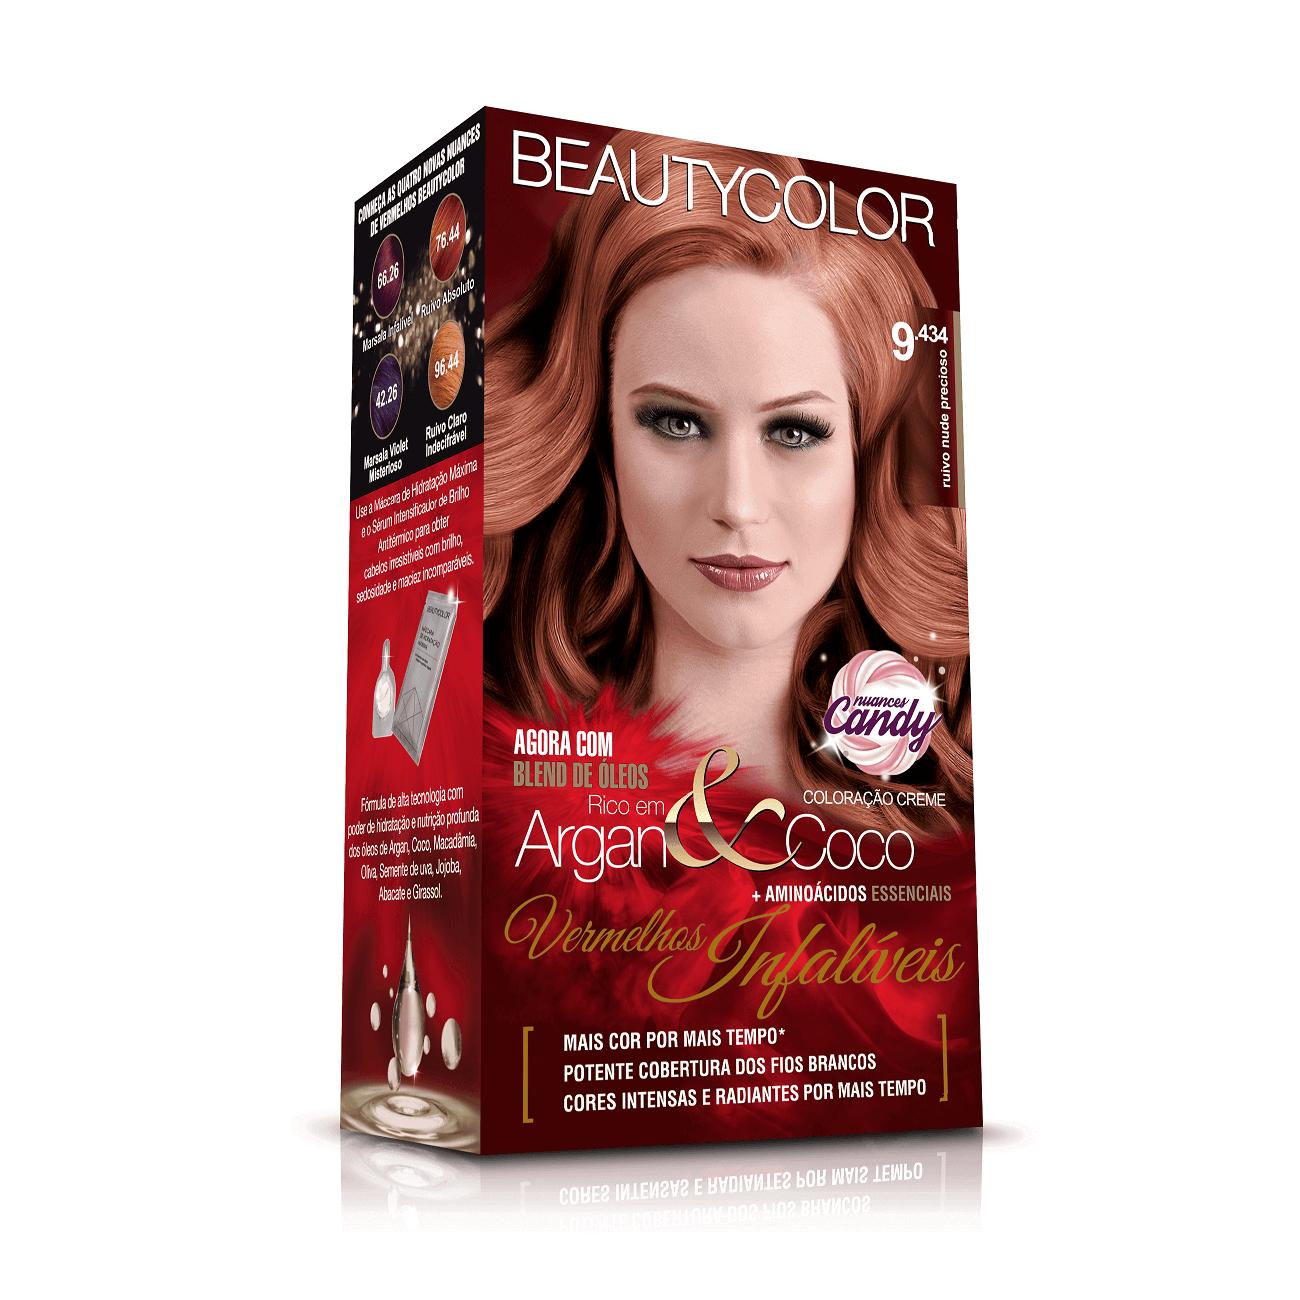 Kit BeautyColor 9.434 - Ruivo Nude Precioso